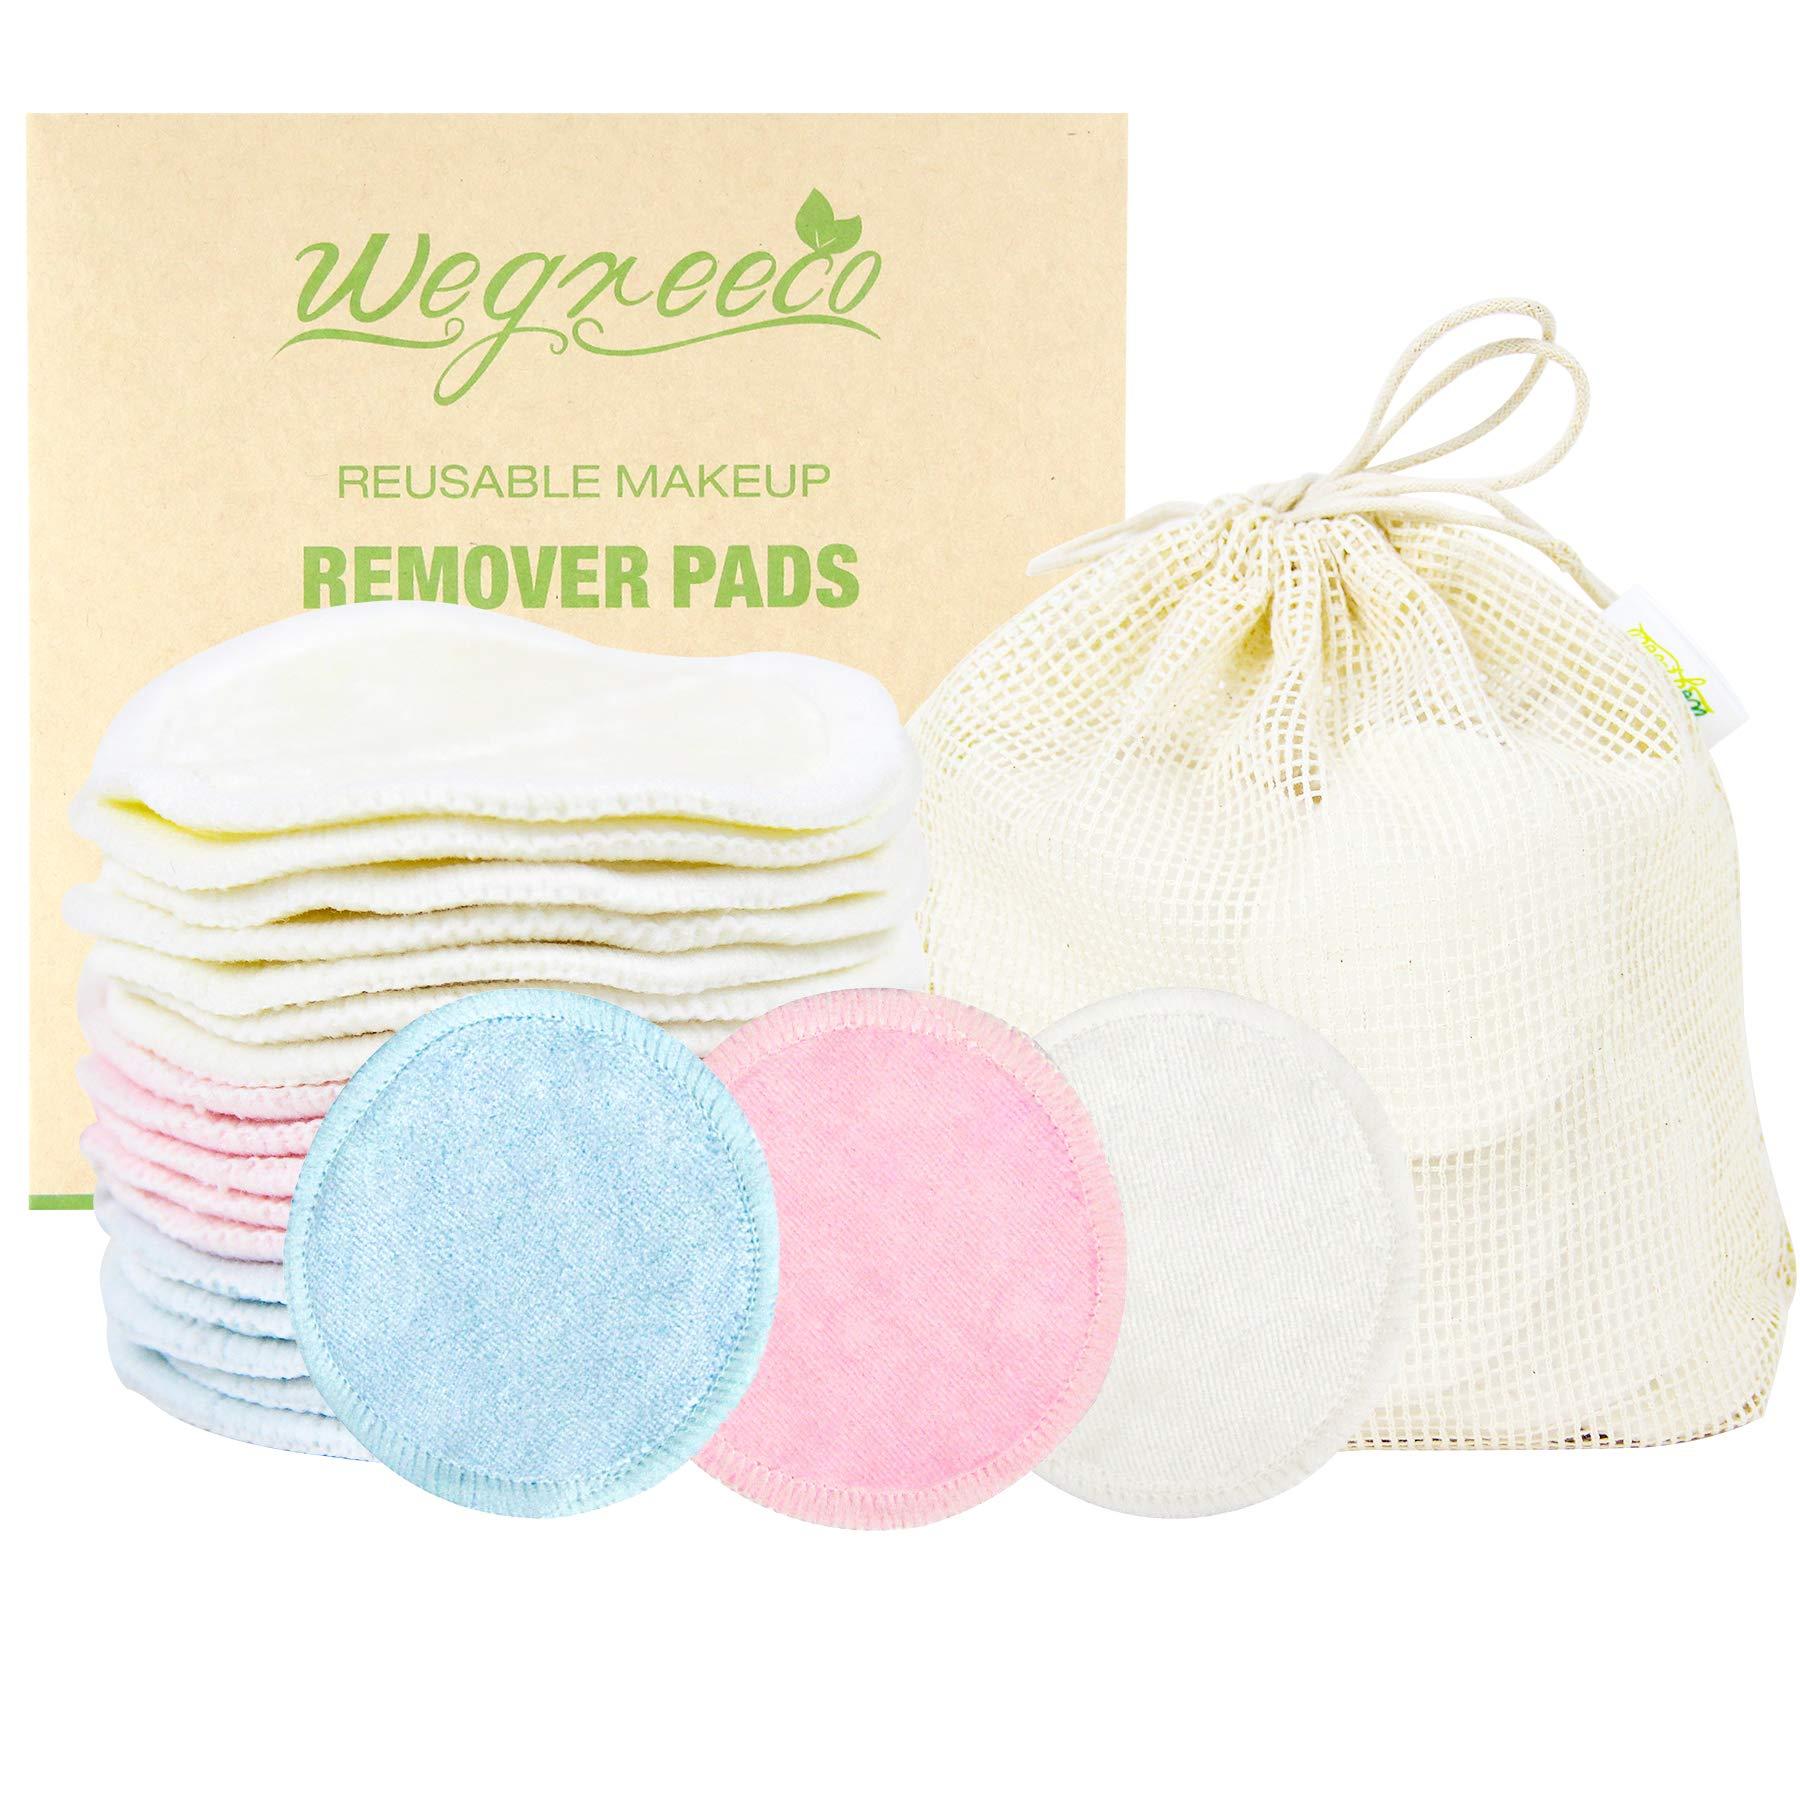 Wegreeco Cotton Rounds Reusable - Reusable Bamboo Makeup Remover Pads for All Skin Types - Bamboo Cotton Cloth for Removing Makeup - Reusable Facial Pads Cotton Rounds (Bamboo Velour, 3 color)